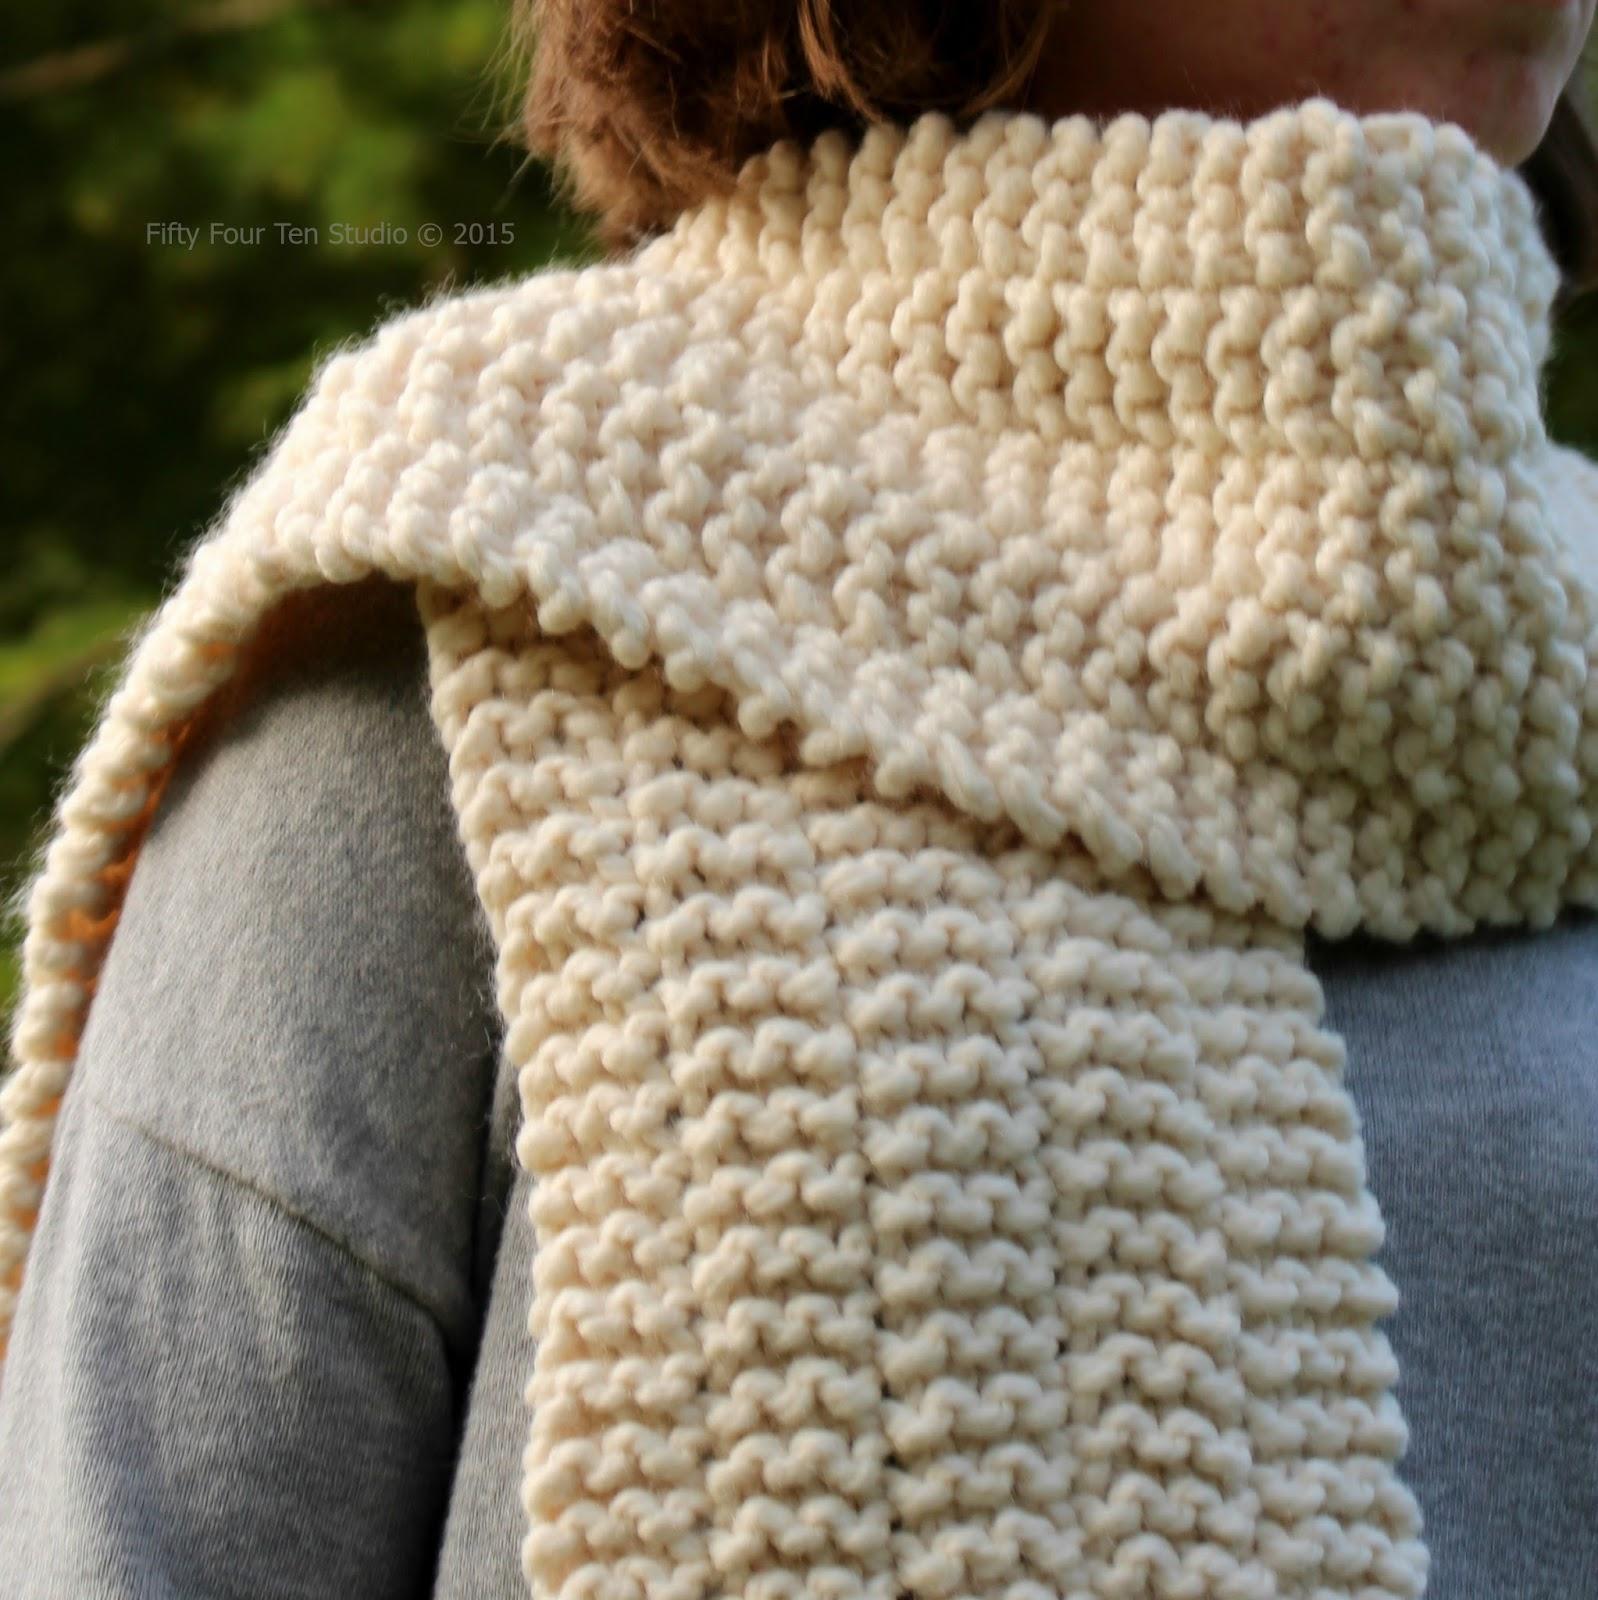 Fifty Four Ten Studio: New Easy Scarf Knitting Pattern ...